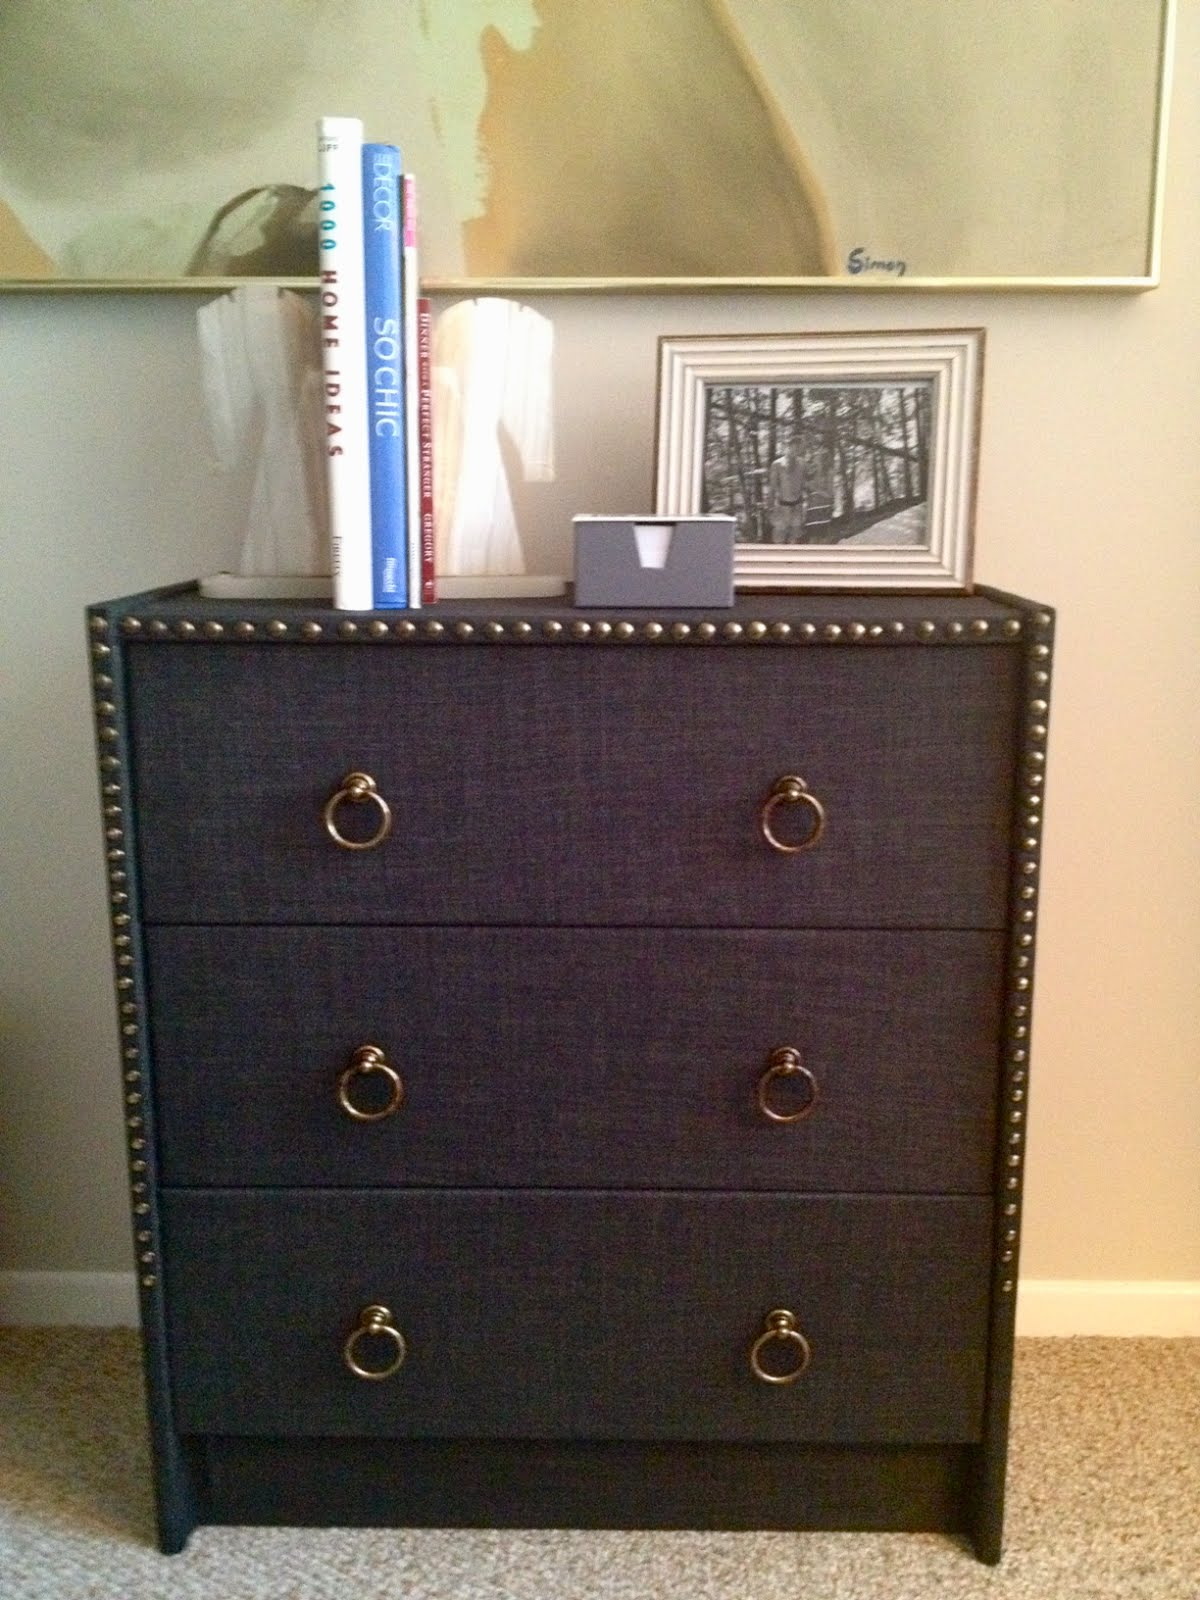 IKEA dresser wrapped in linen fabric